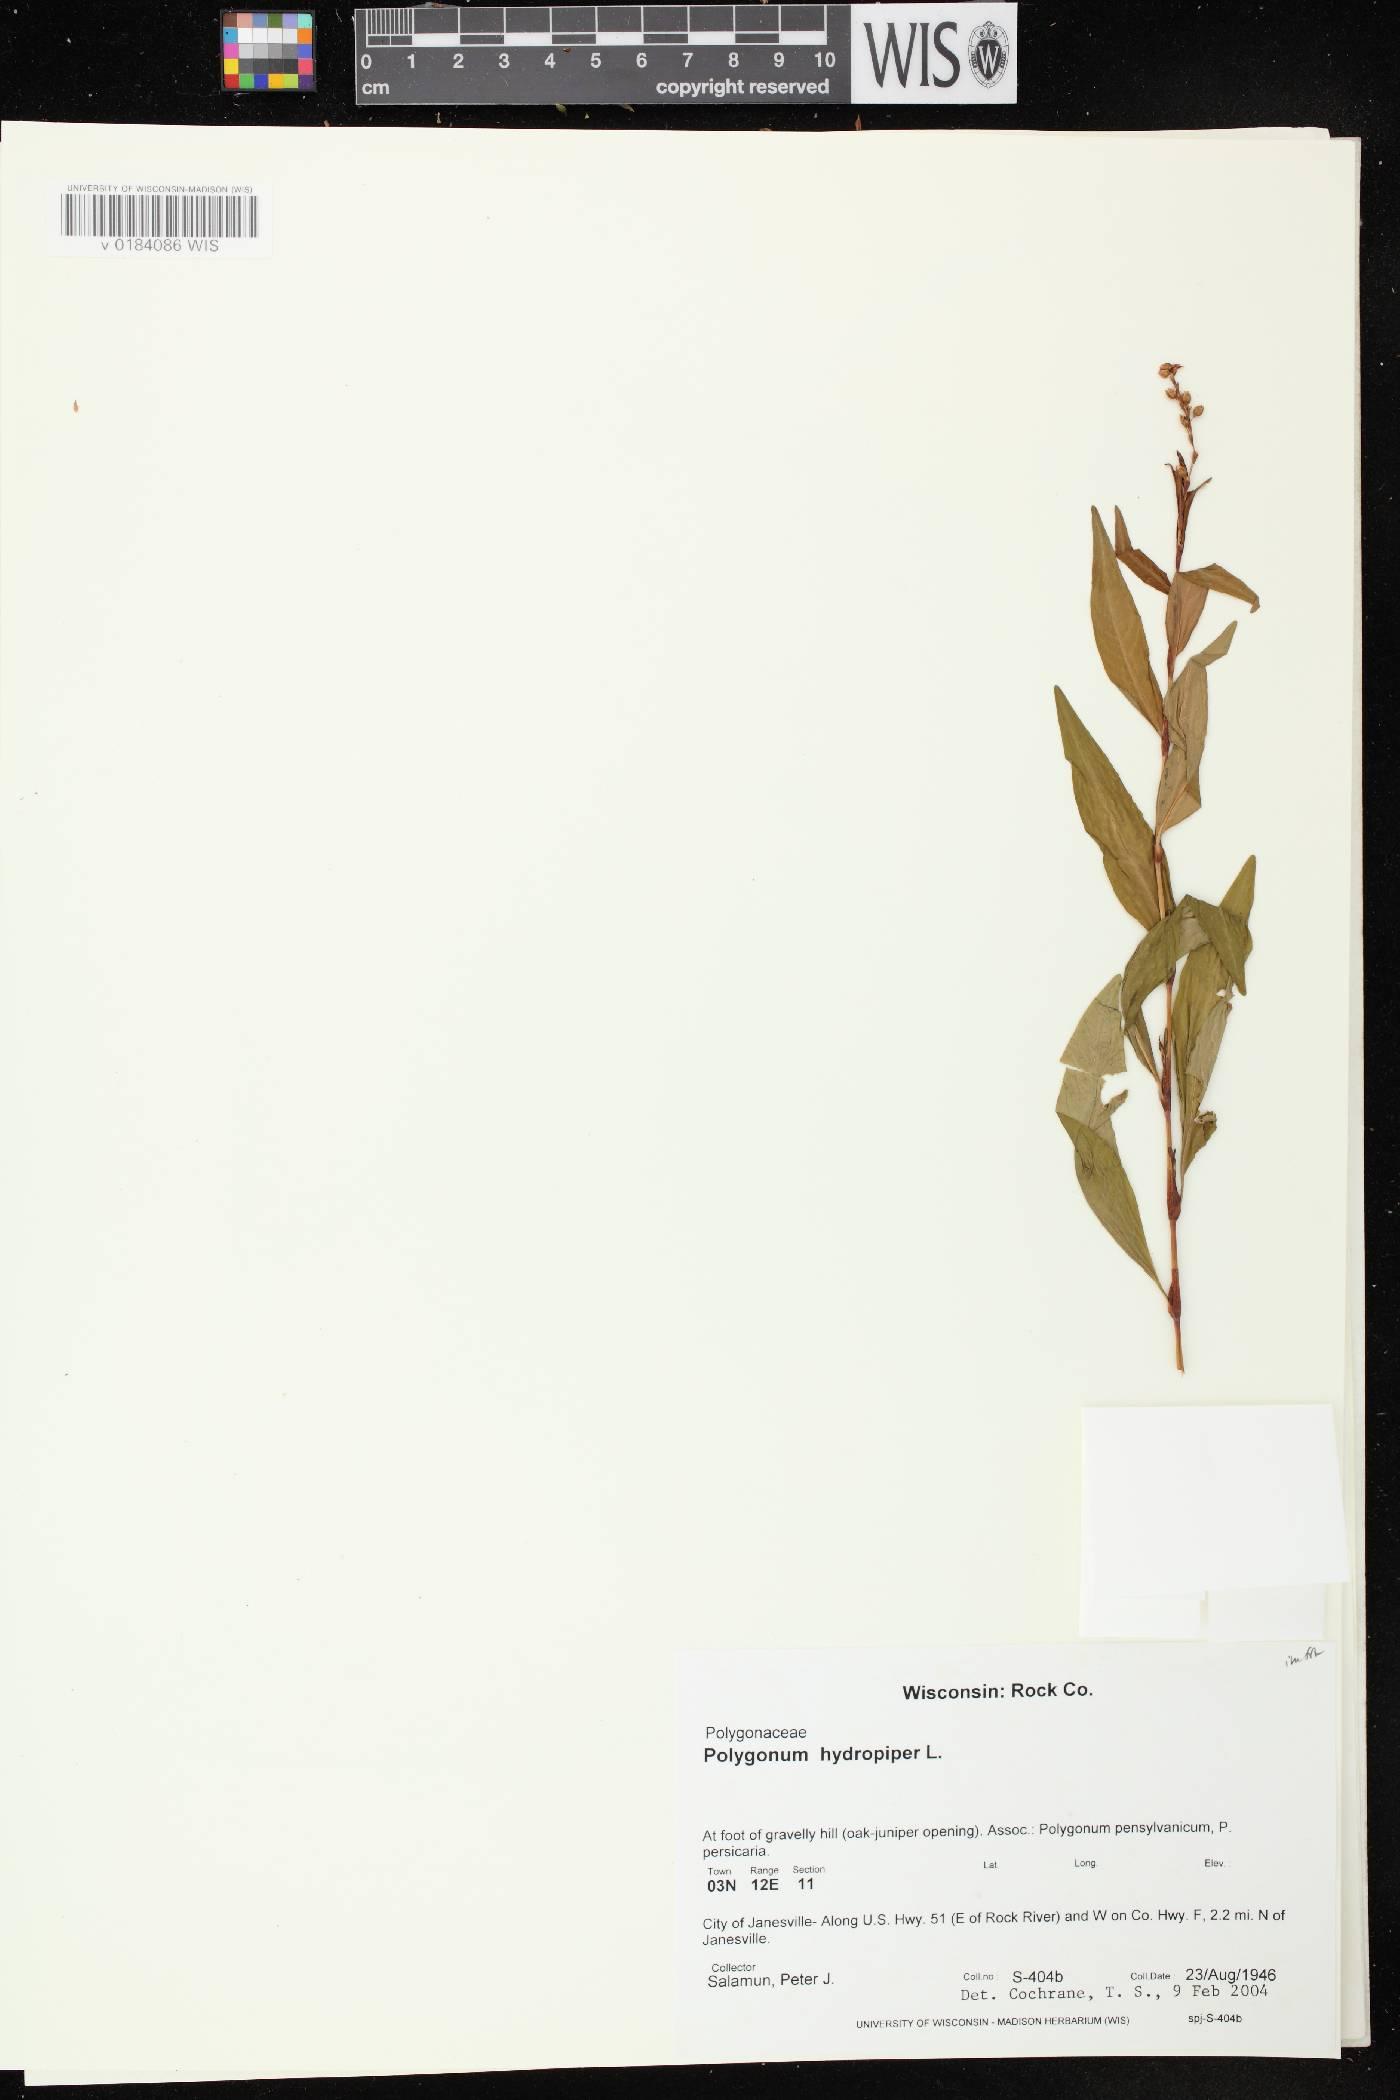 Persicaria hydropiper image